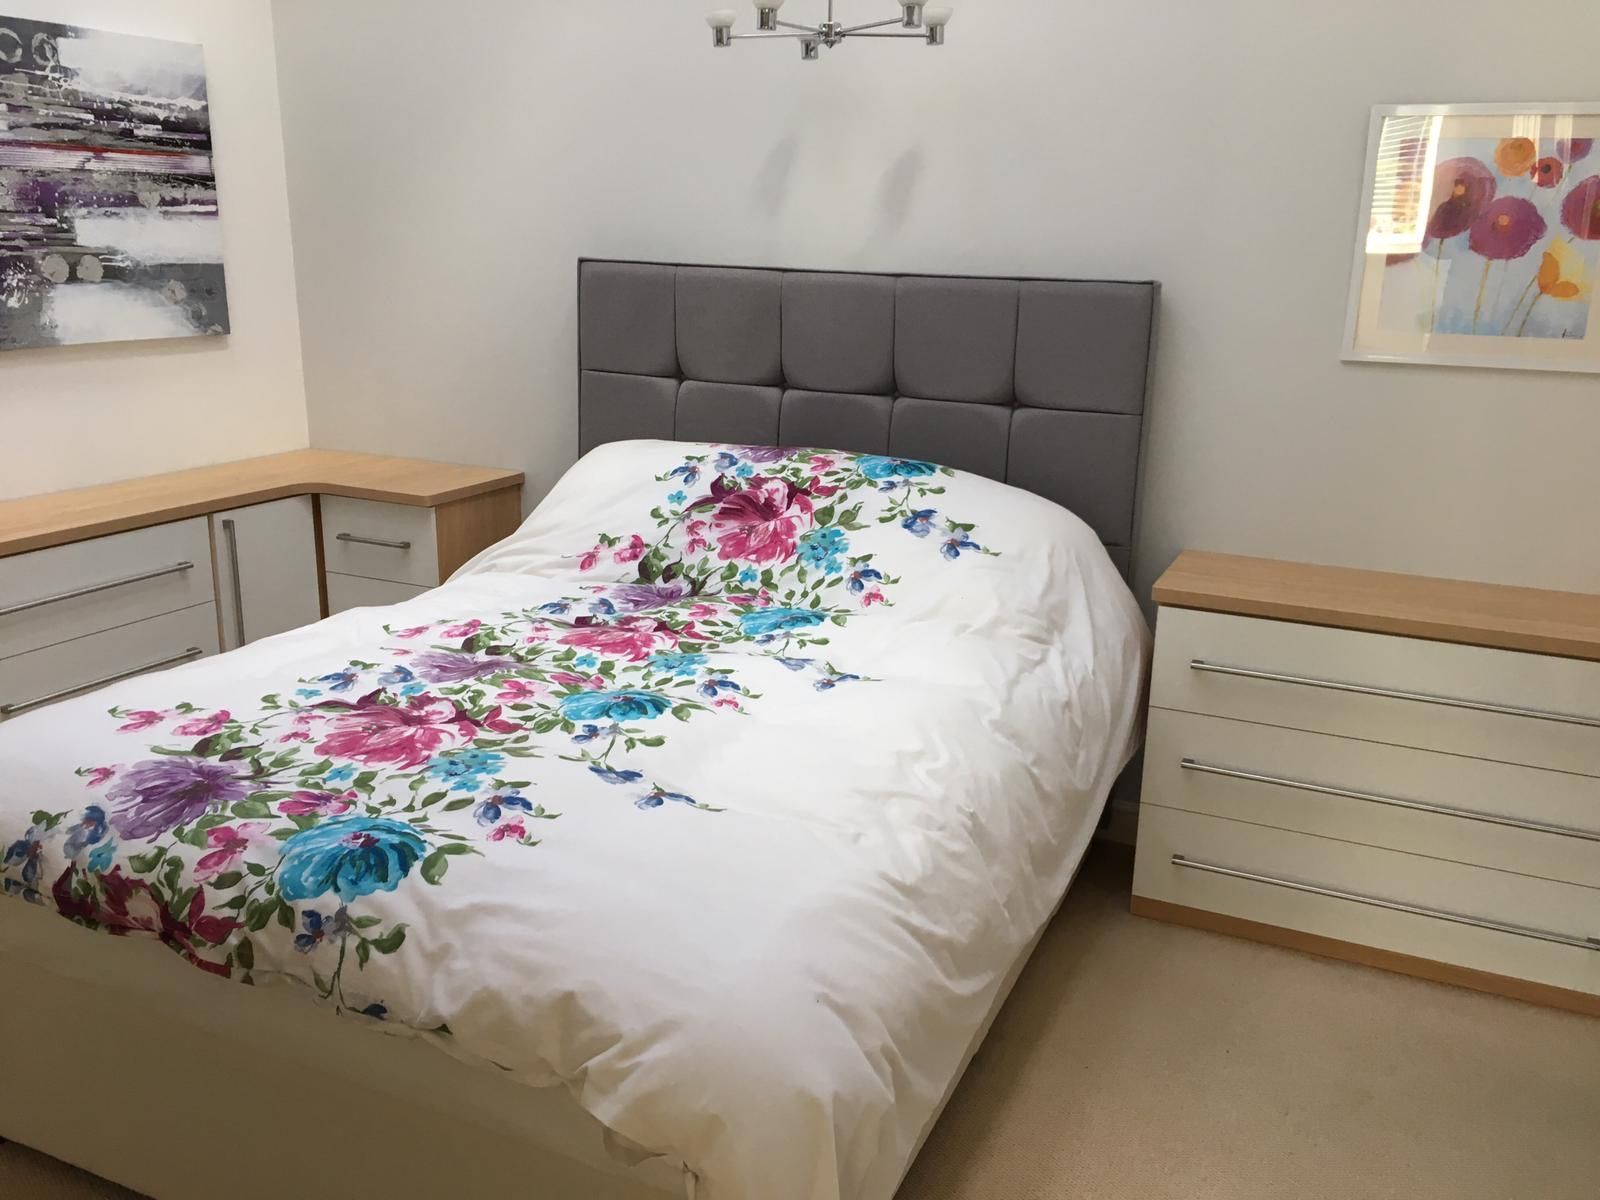 Cream Gloss Bedroom Furniture On An Oak